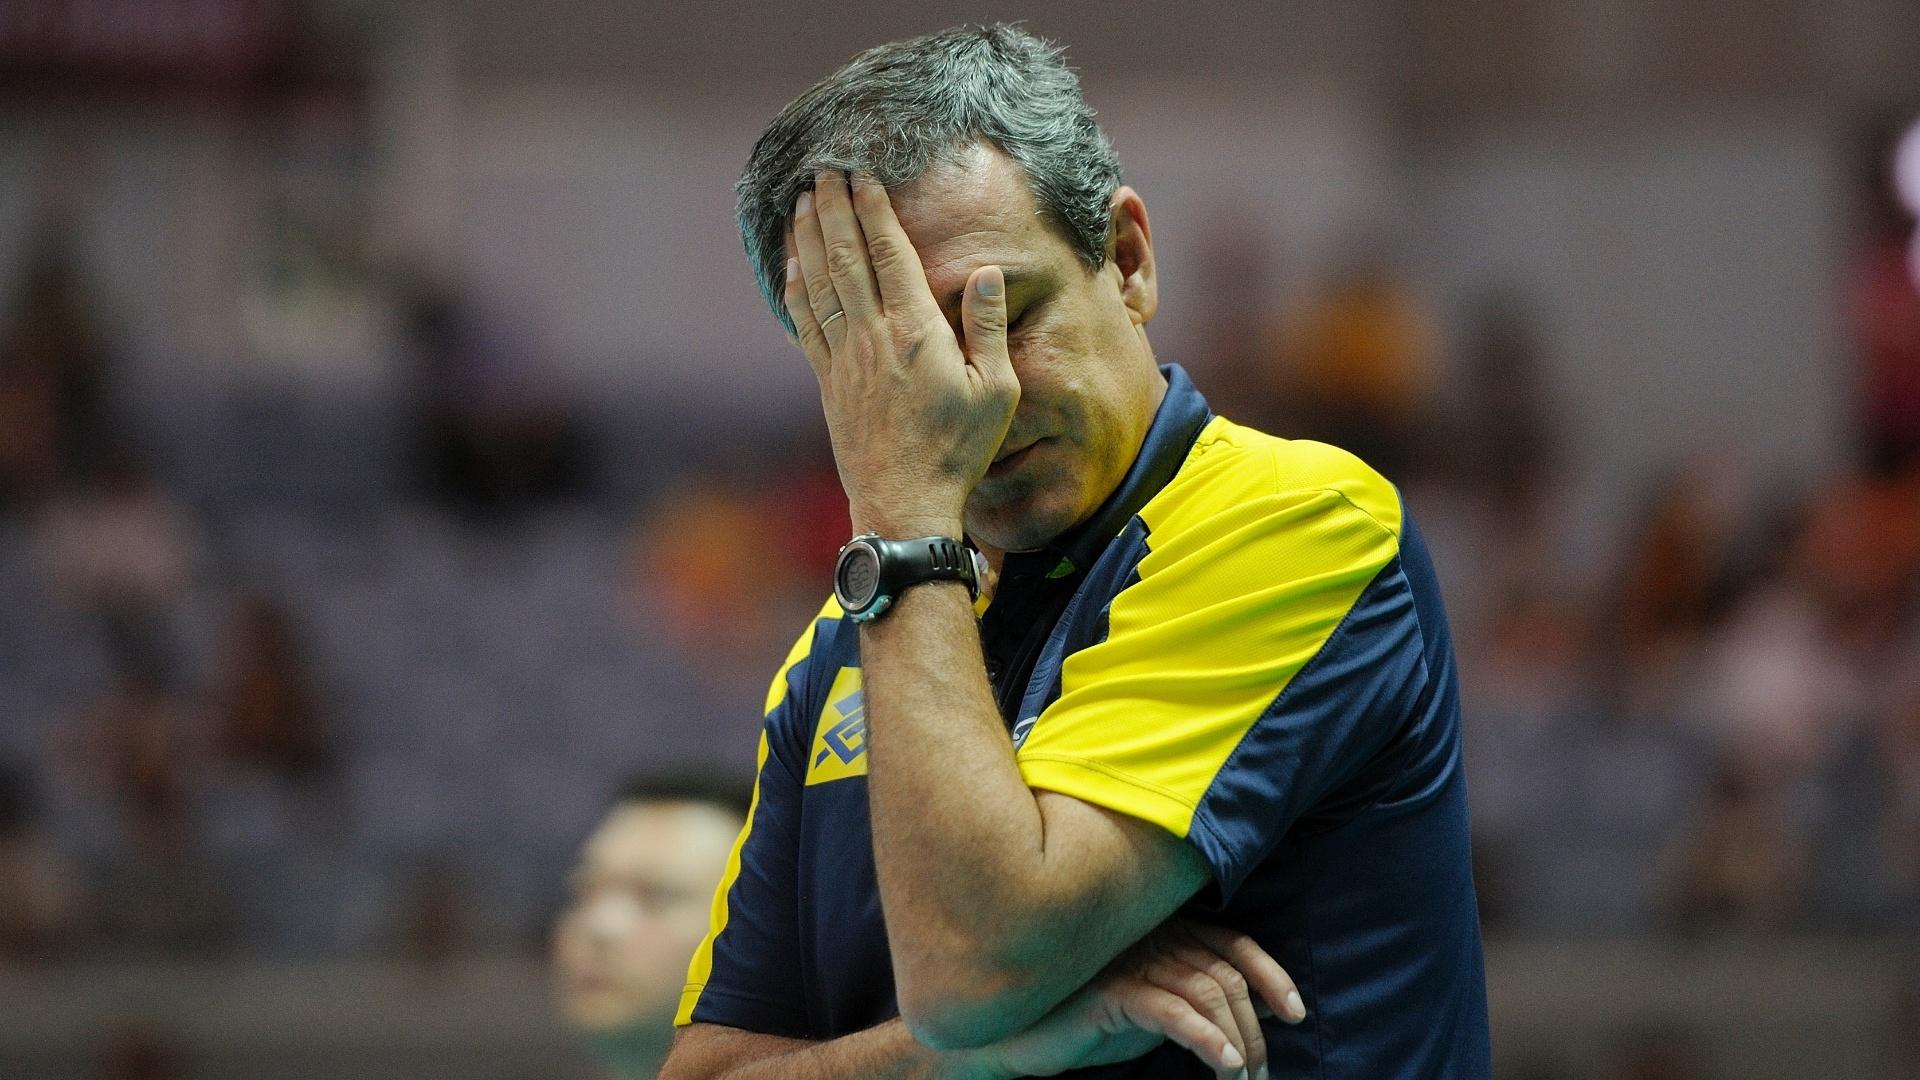 O técnico Zé Roberto Guimarães reage durante o confronto entre Brasil e Turquia